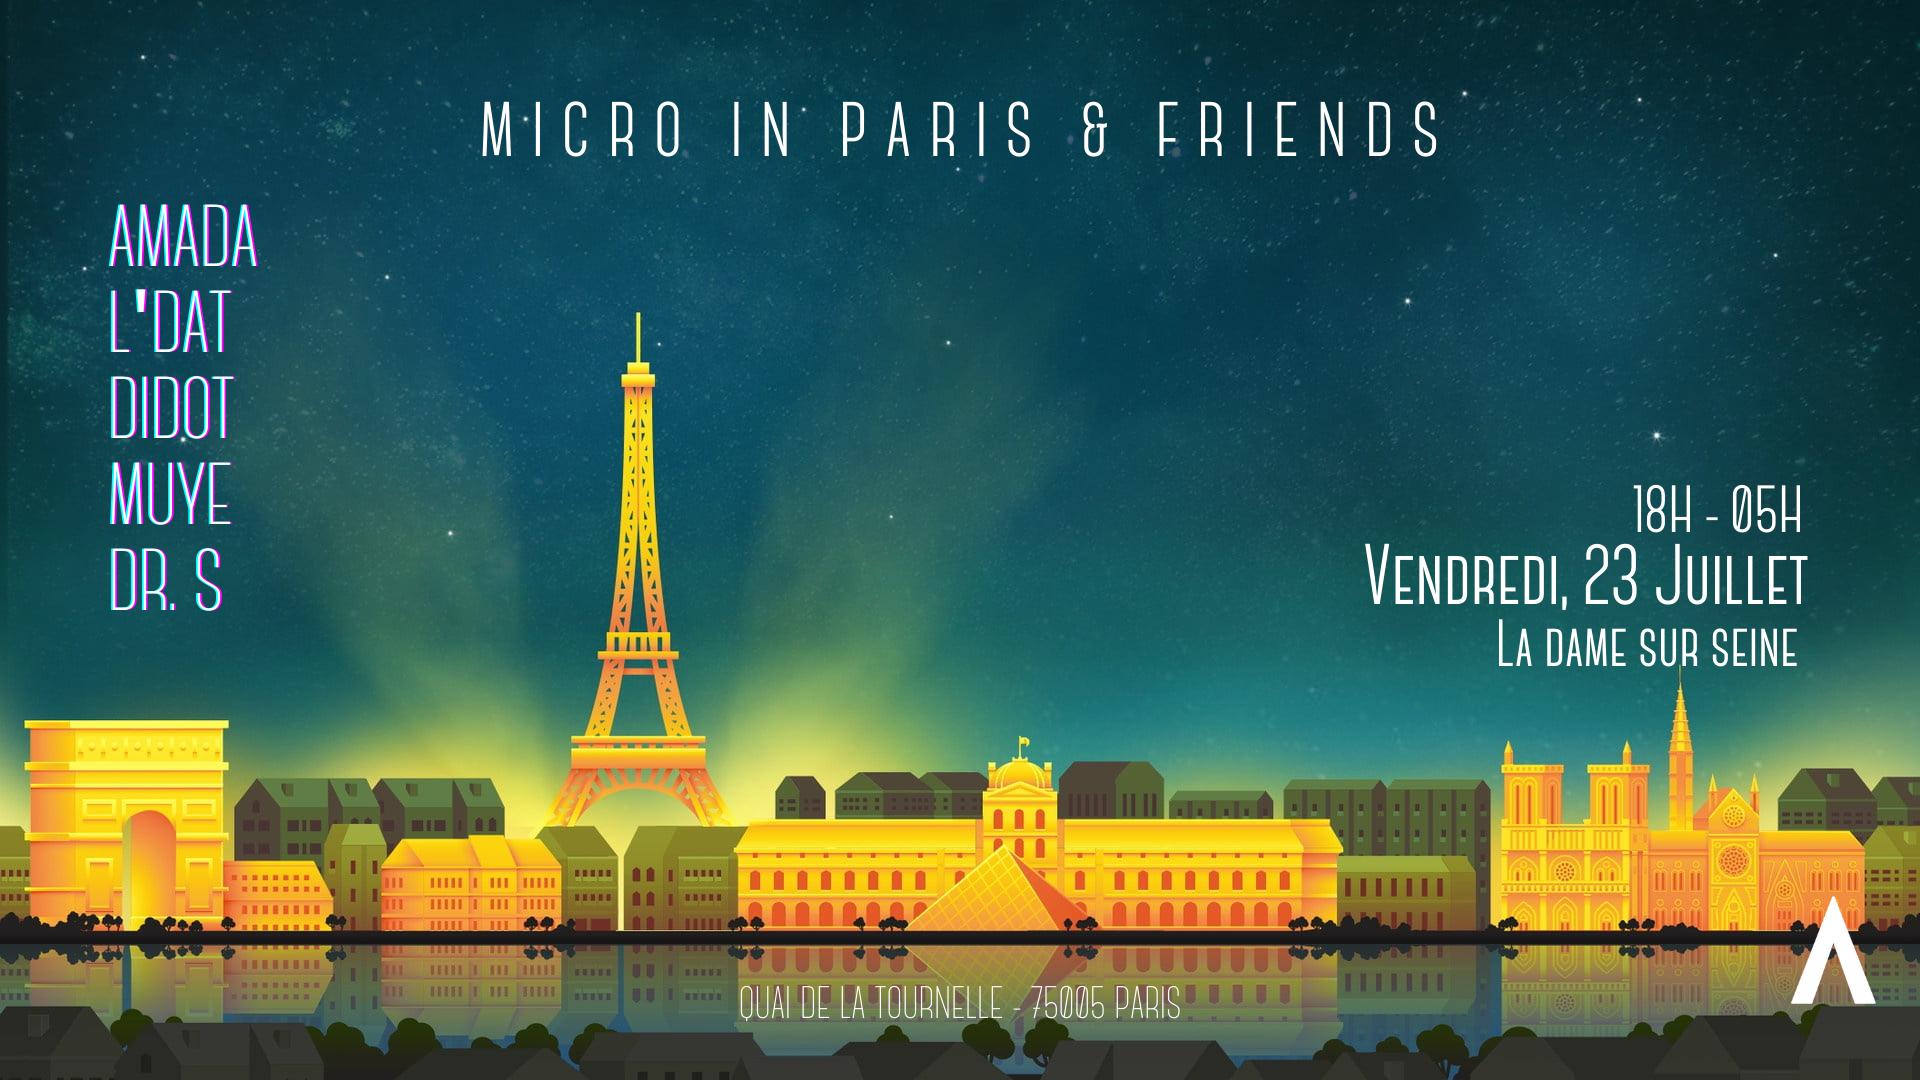 Micro in Paris x Friends - All Night Long